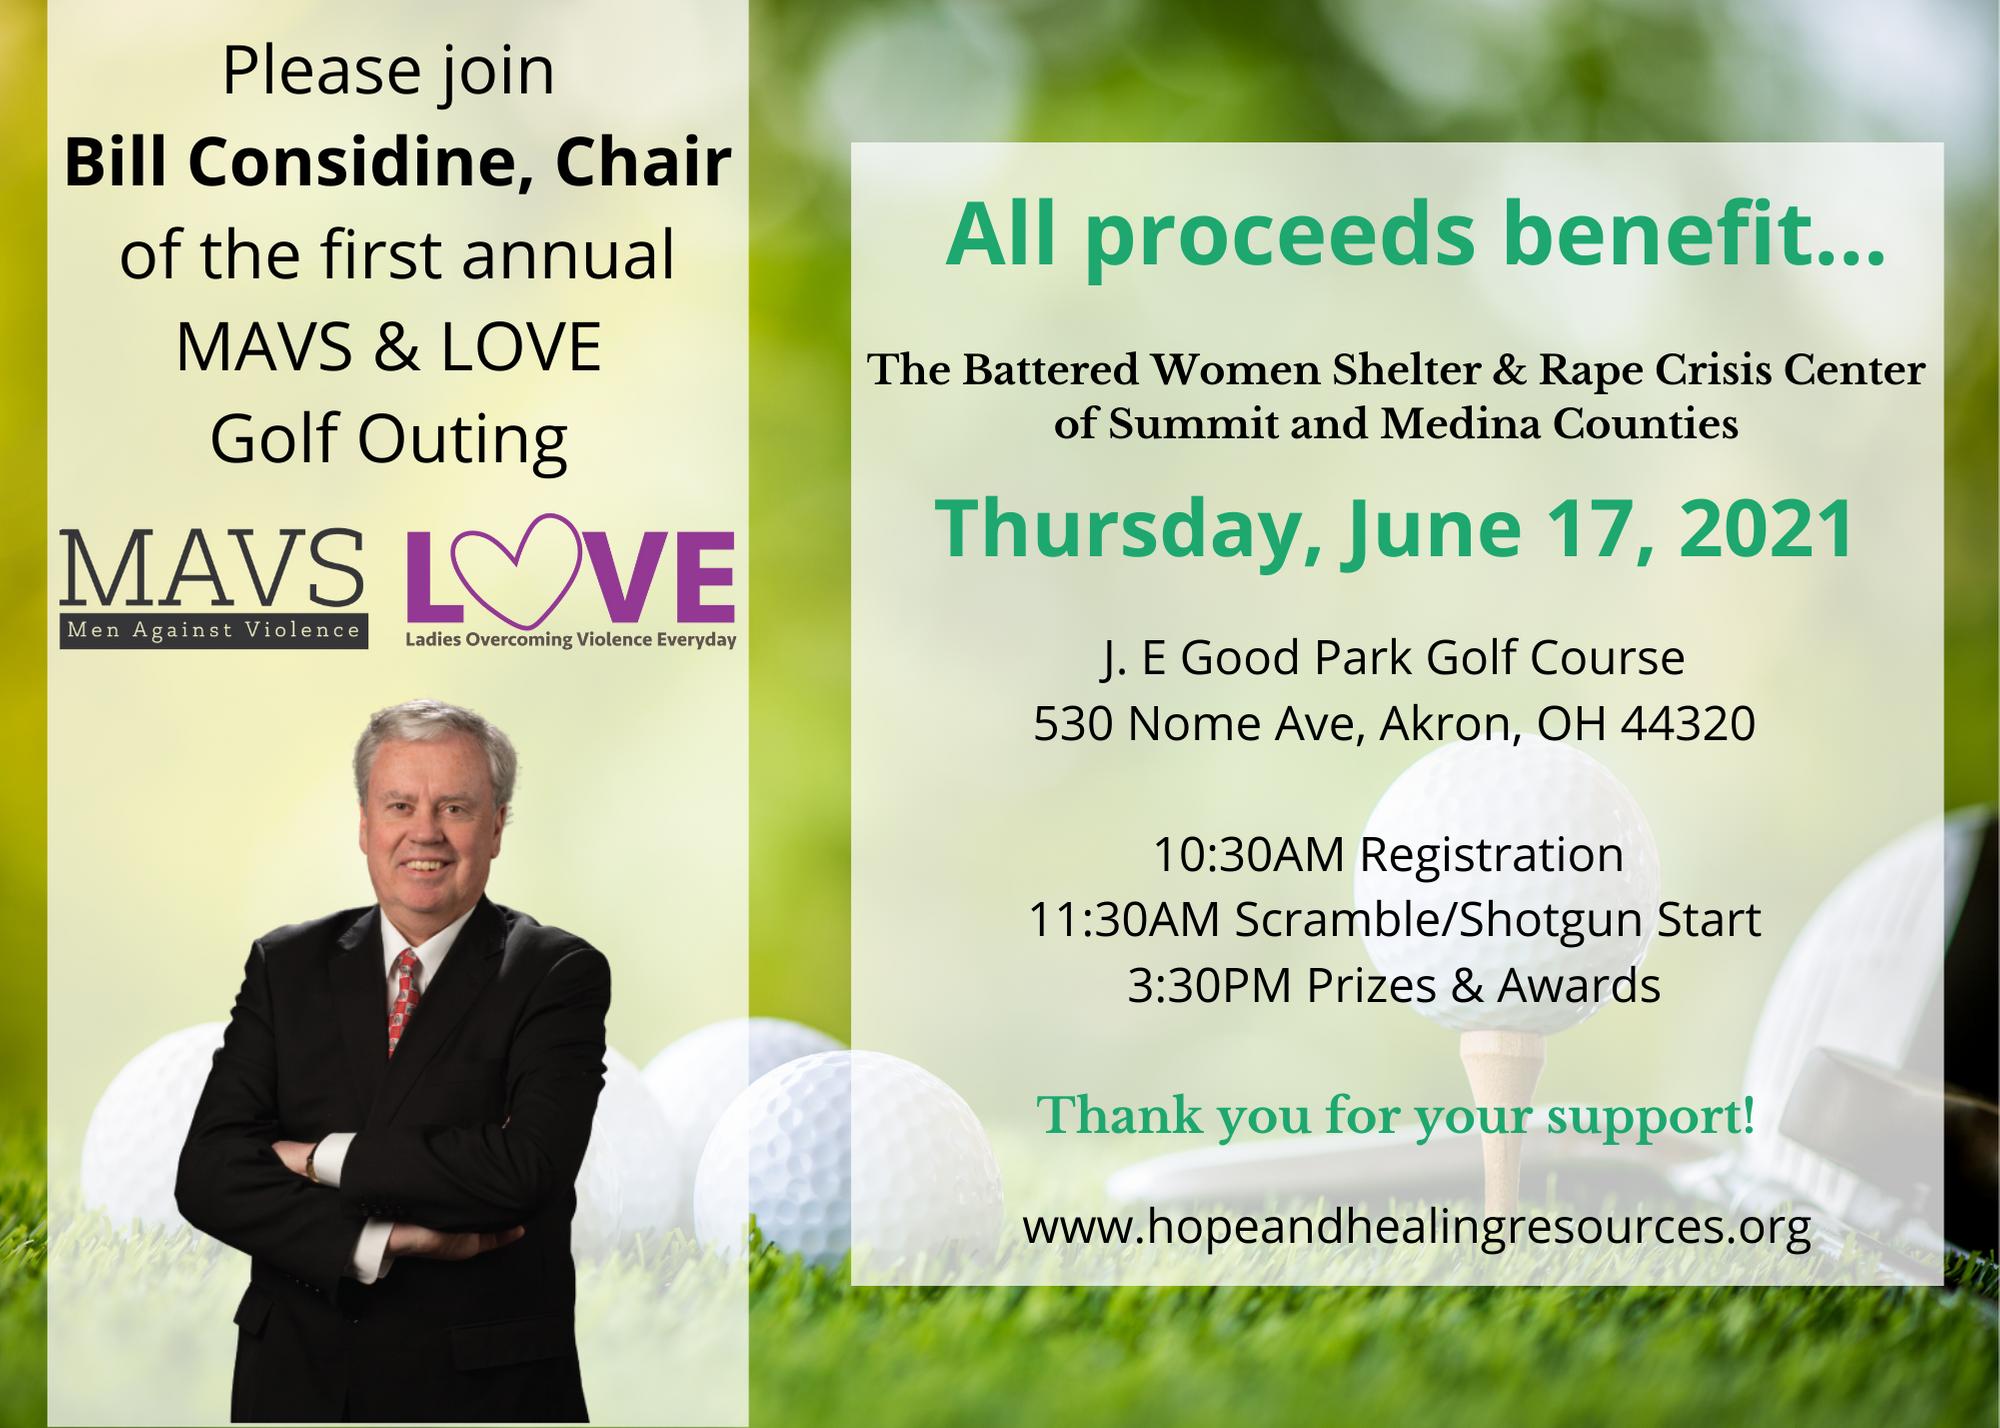 MAVS & LOVE Golf Outing 2021